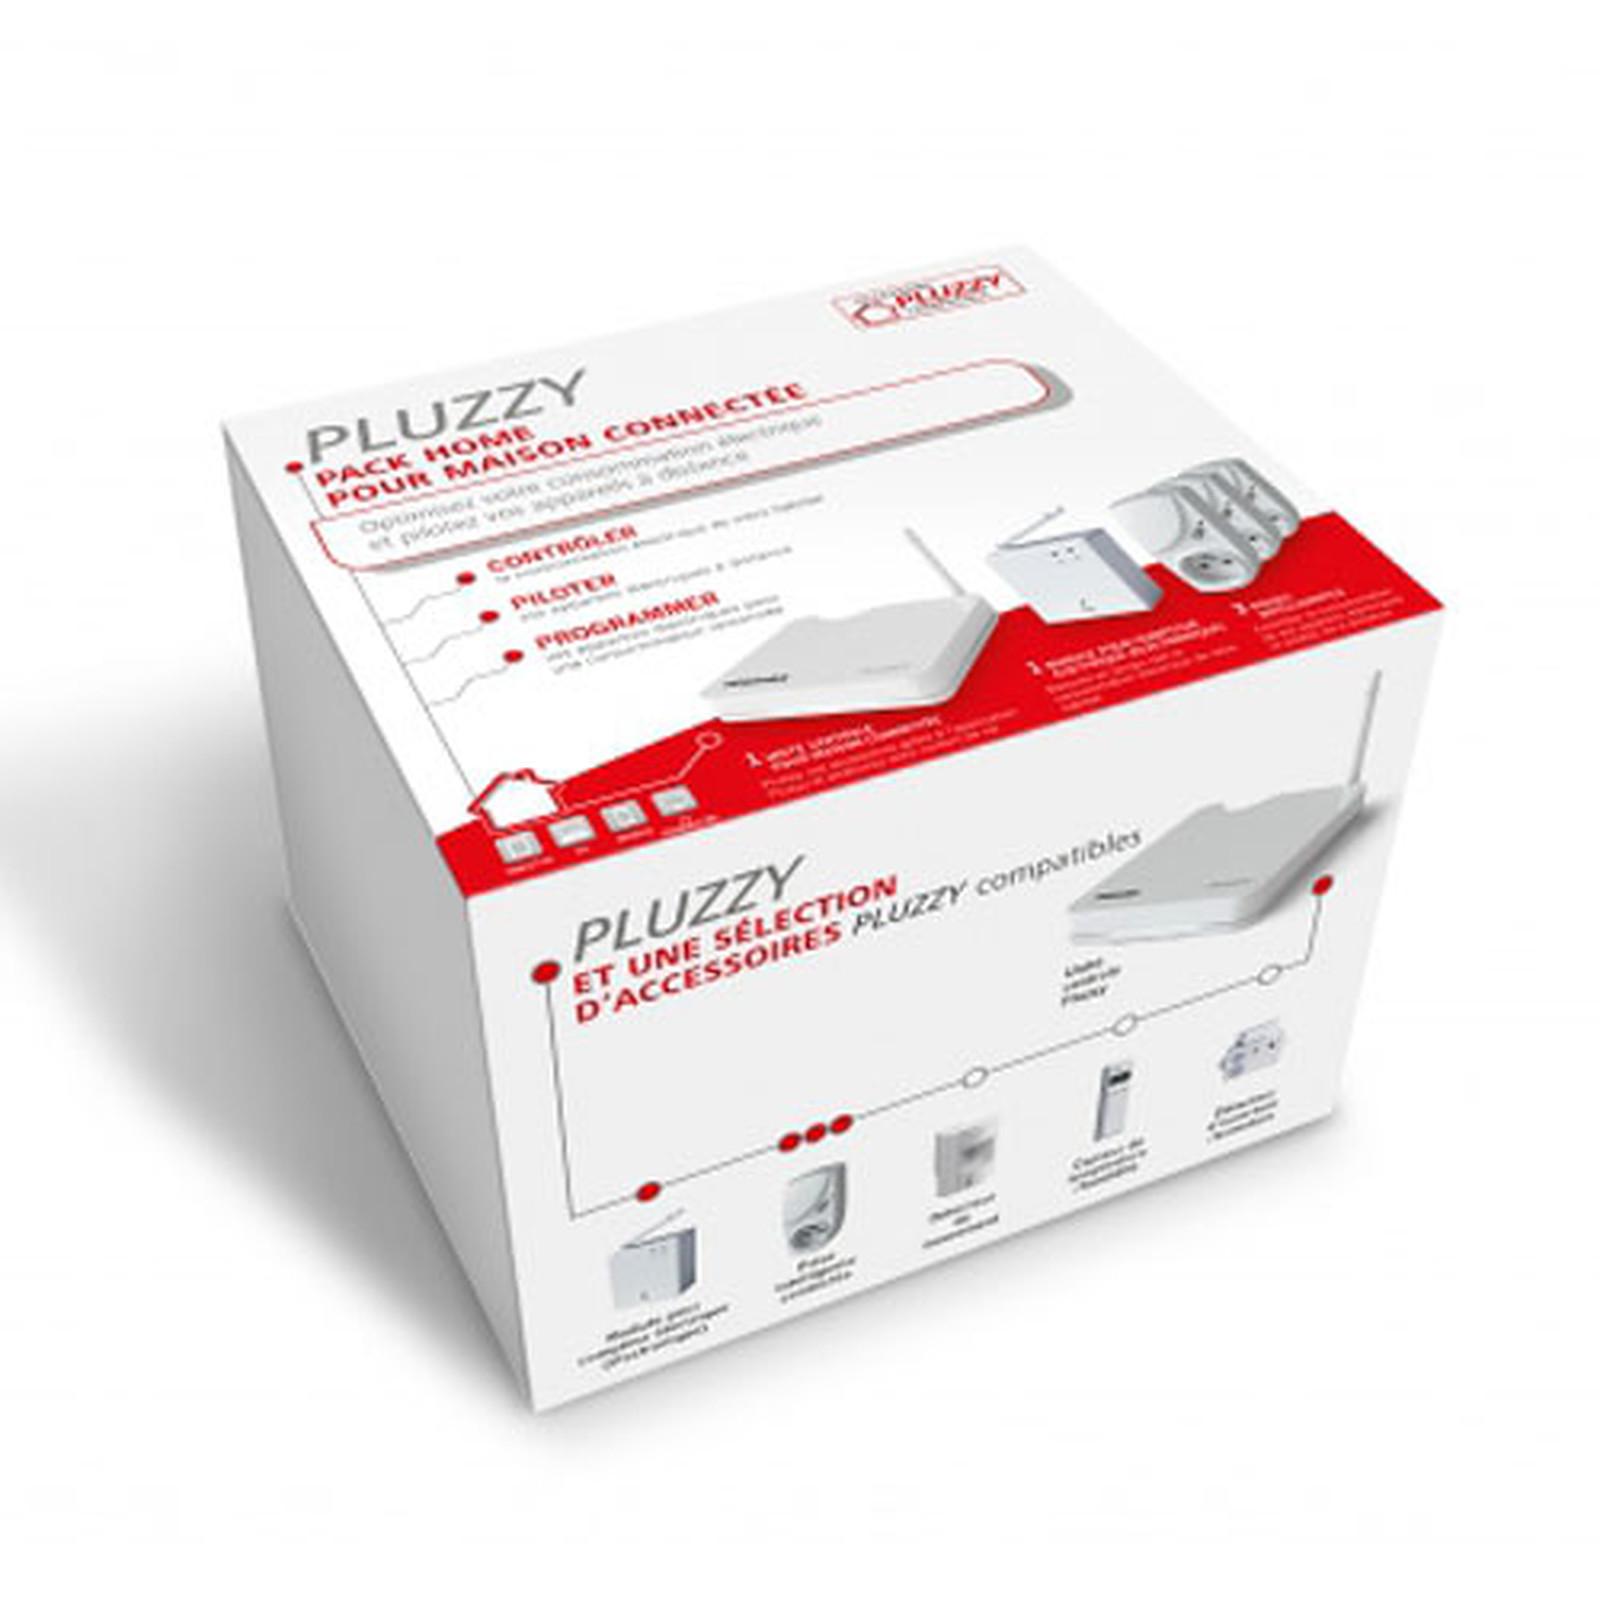 Toshiba Pluzzy Pack Home